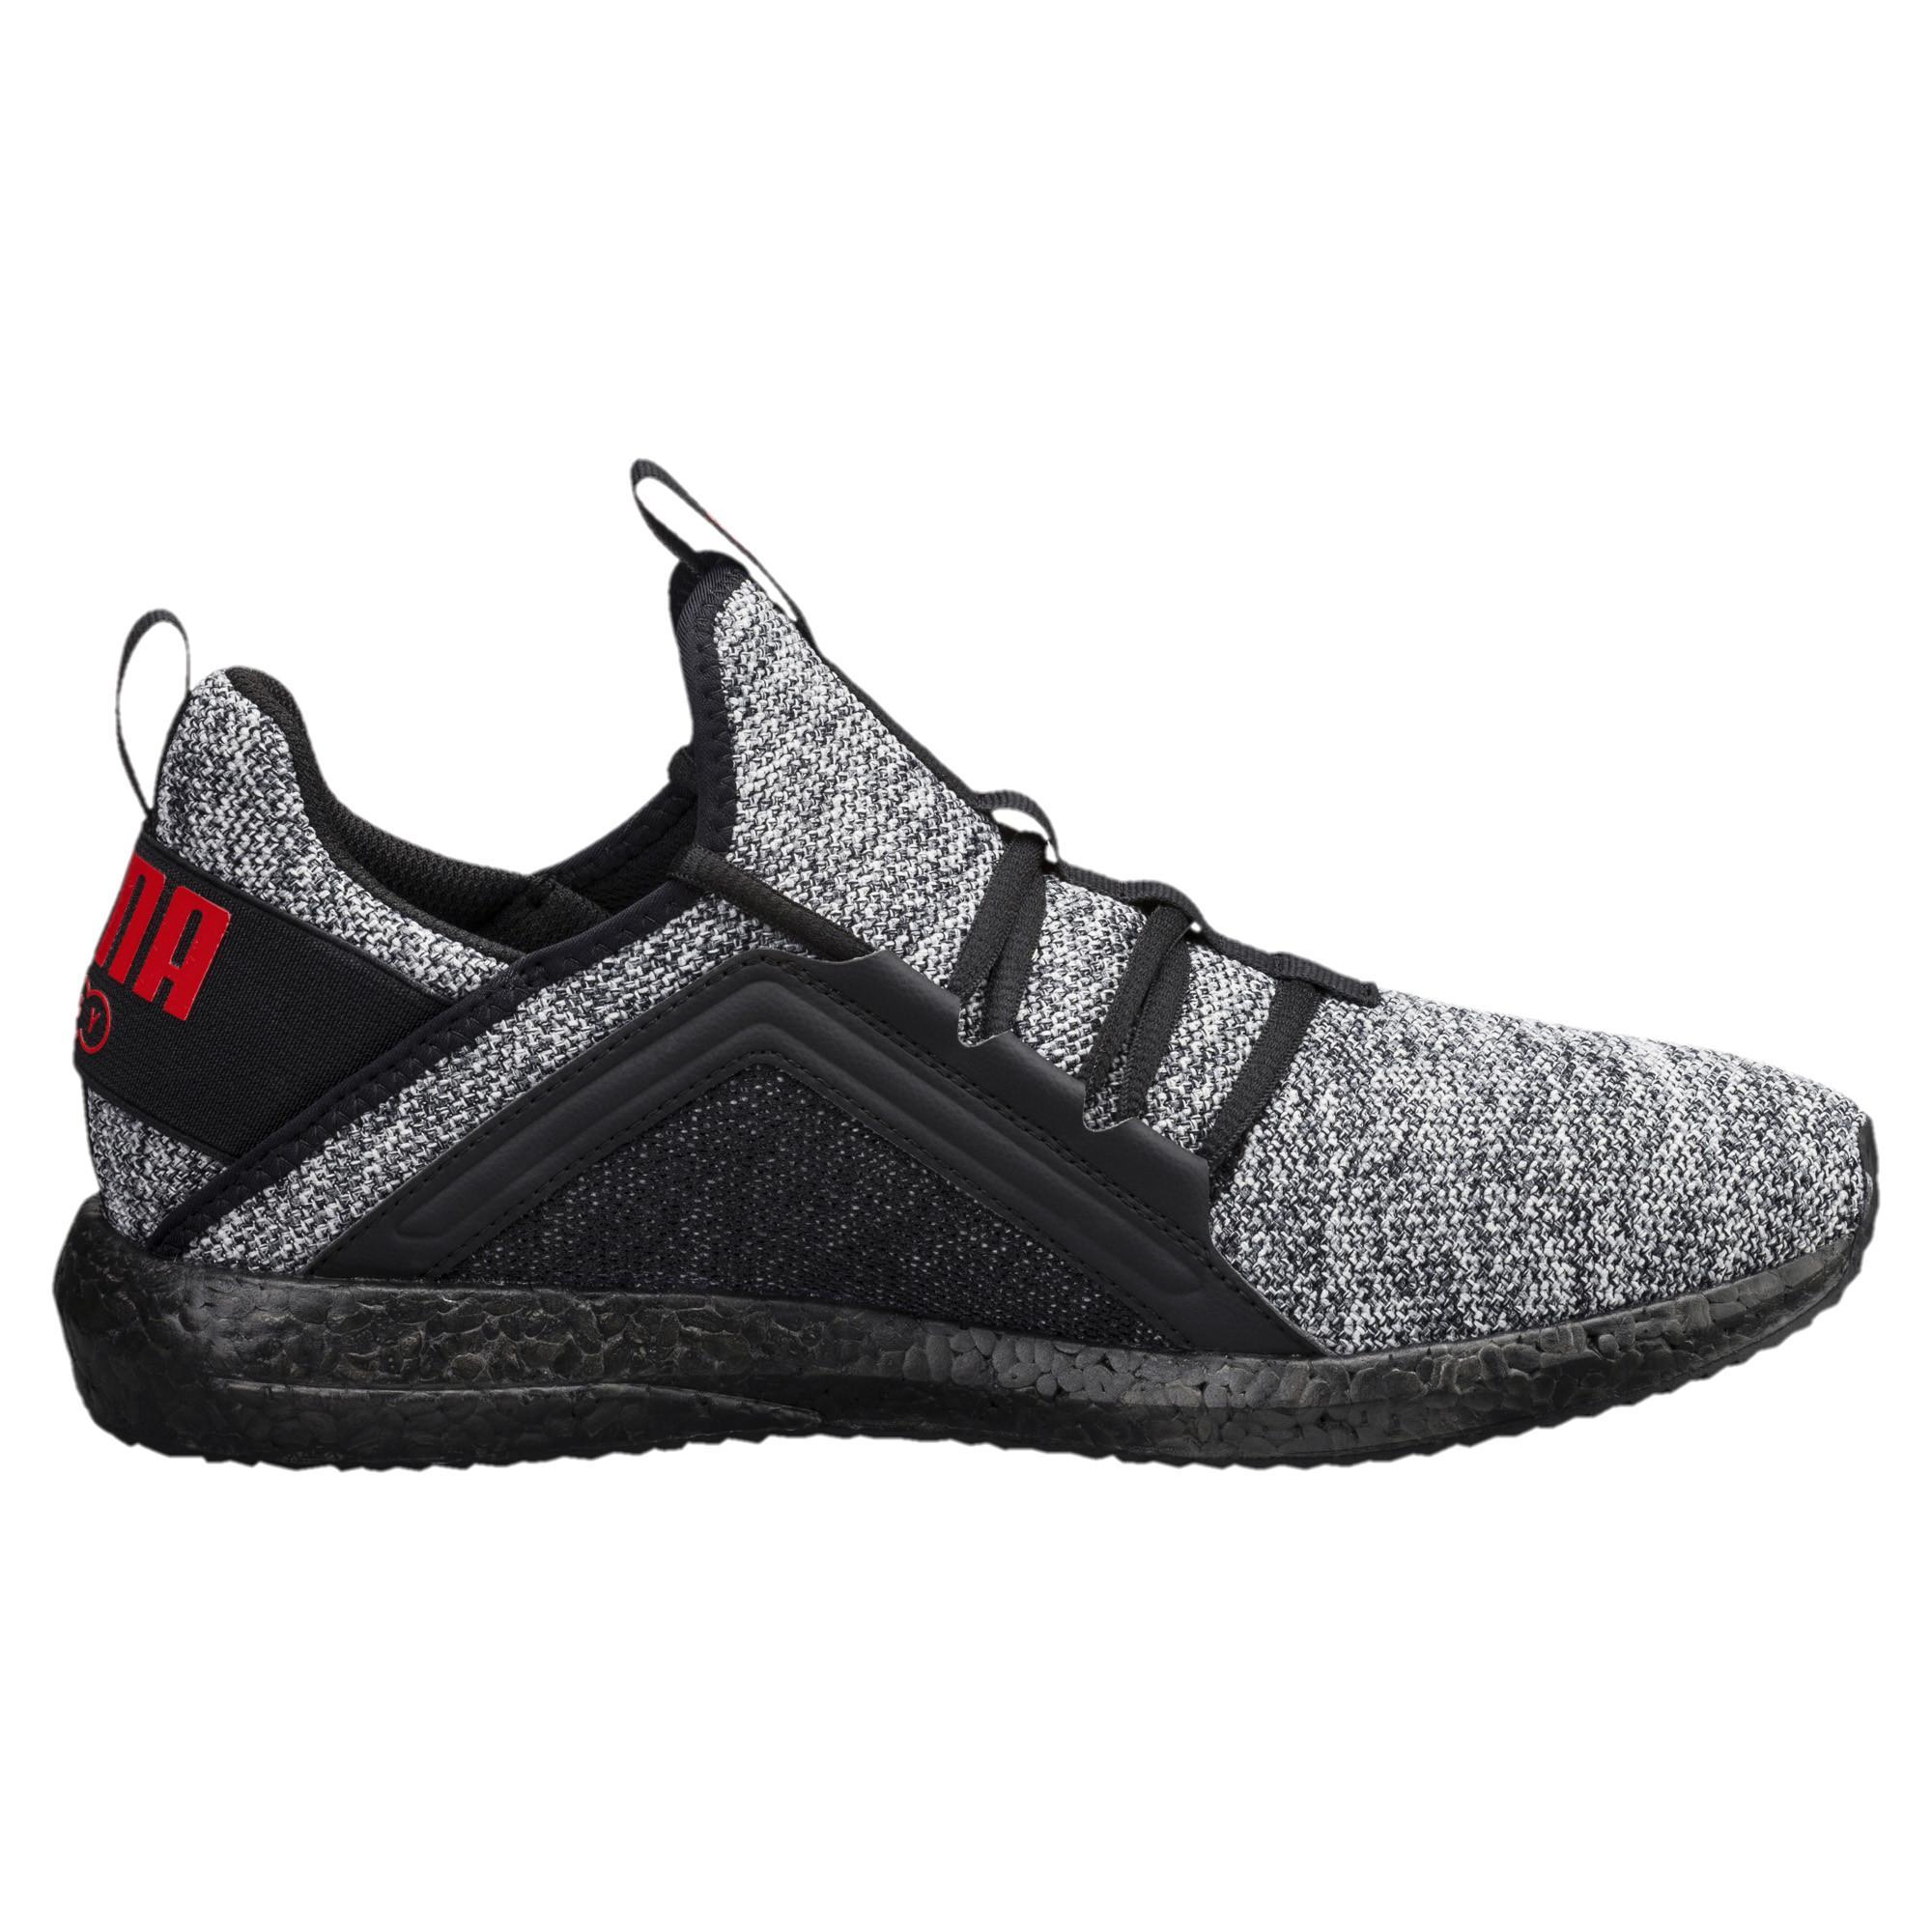 Mega Nrgy Knit Sneaker